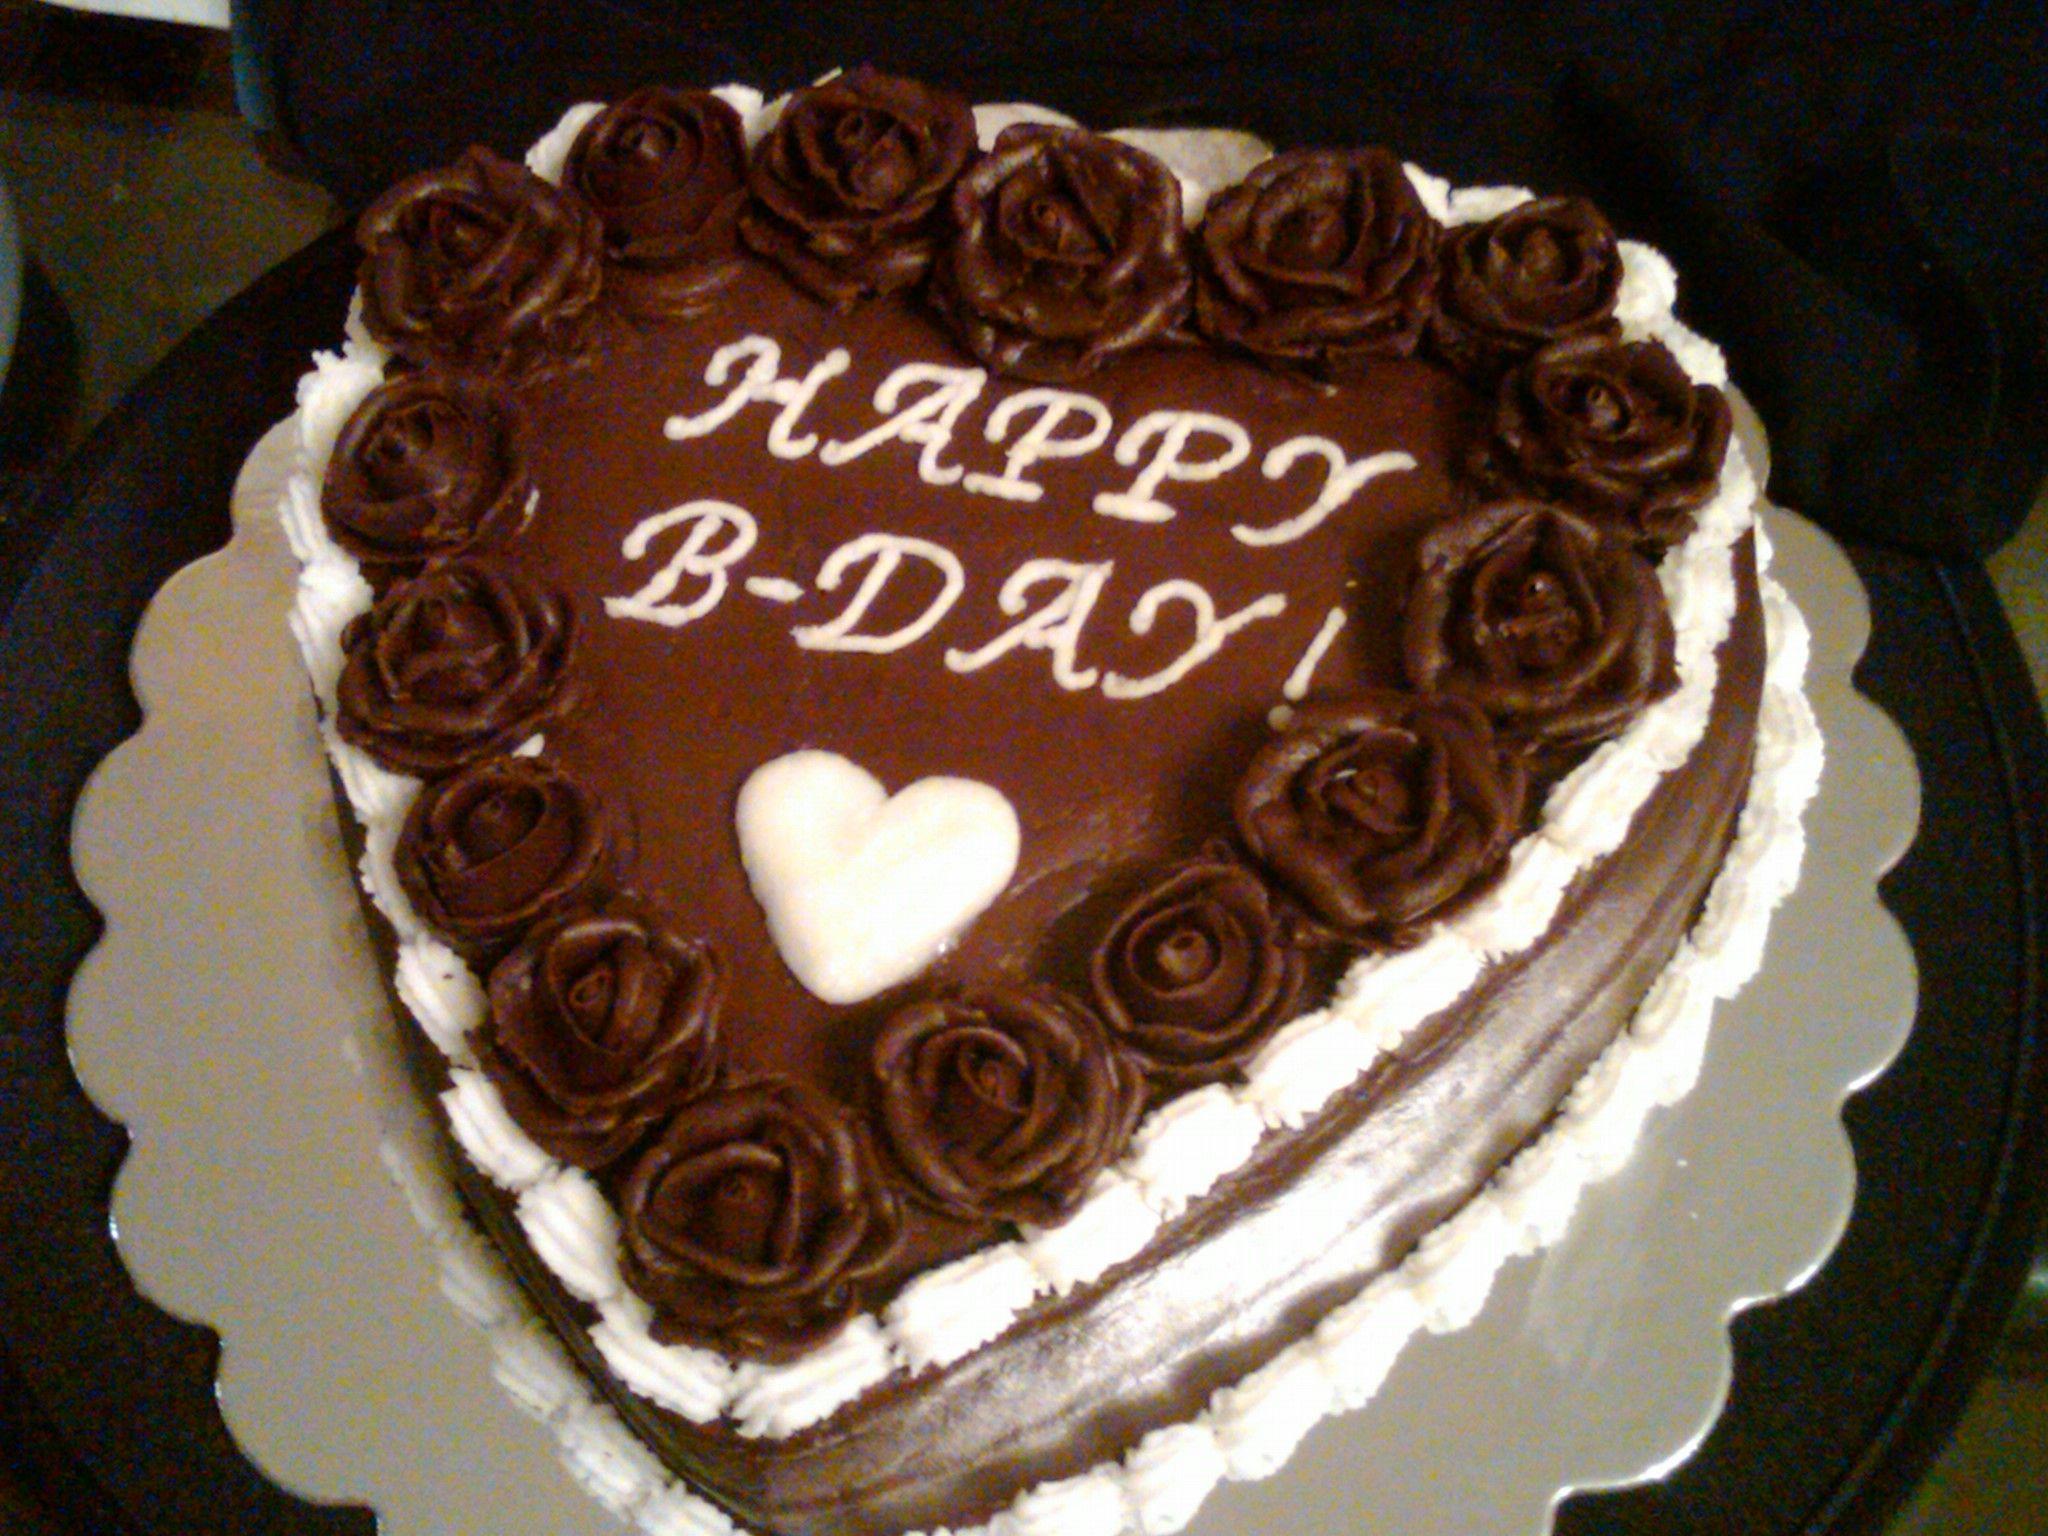 Terrific Chocolate Cake For My Husbands Birthday Cake Chocolate Cake Funny Birthday Cards Online Fluifree Goldxyz